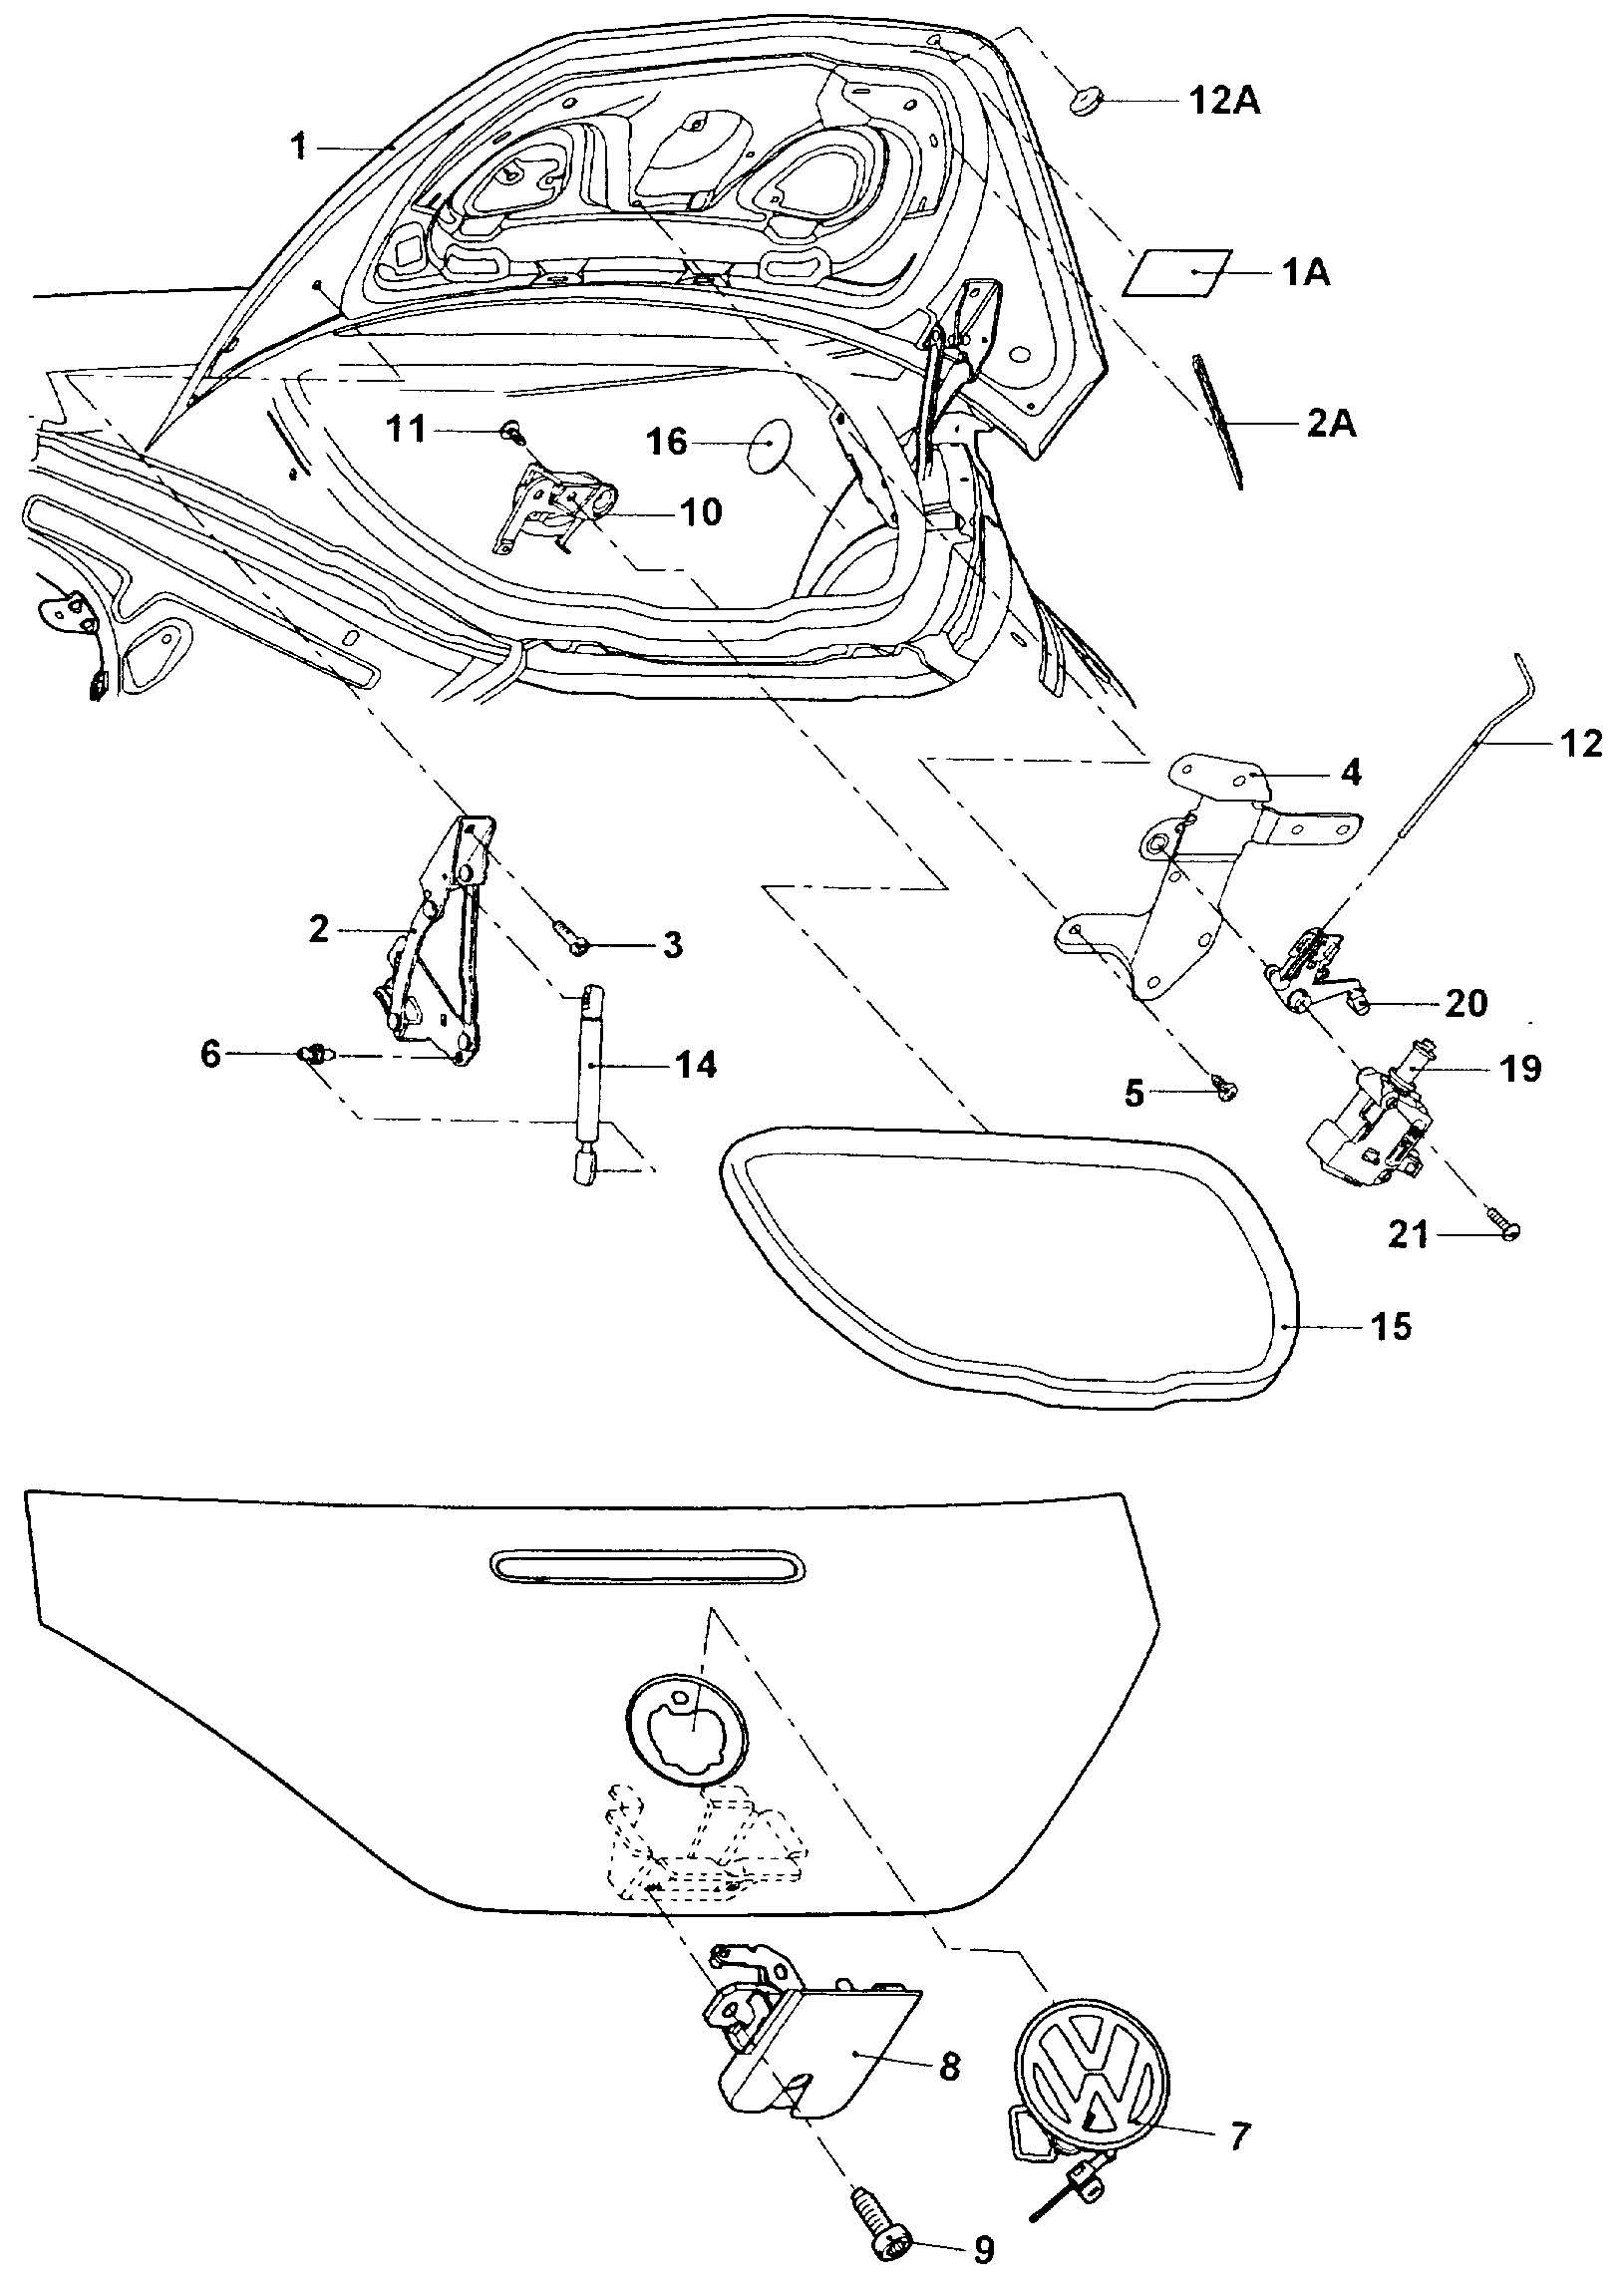 1989 ford f 250 dual fuel tank diagram